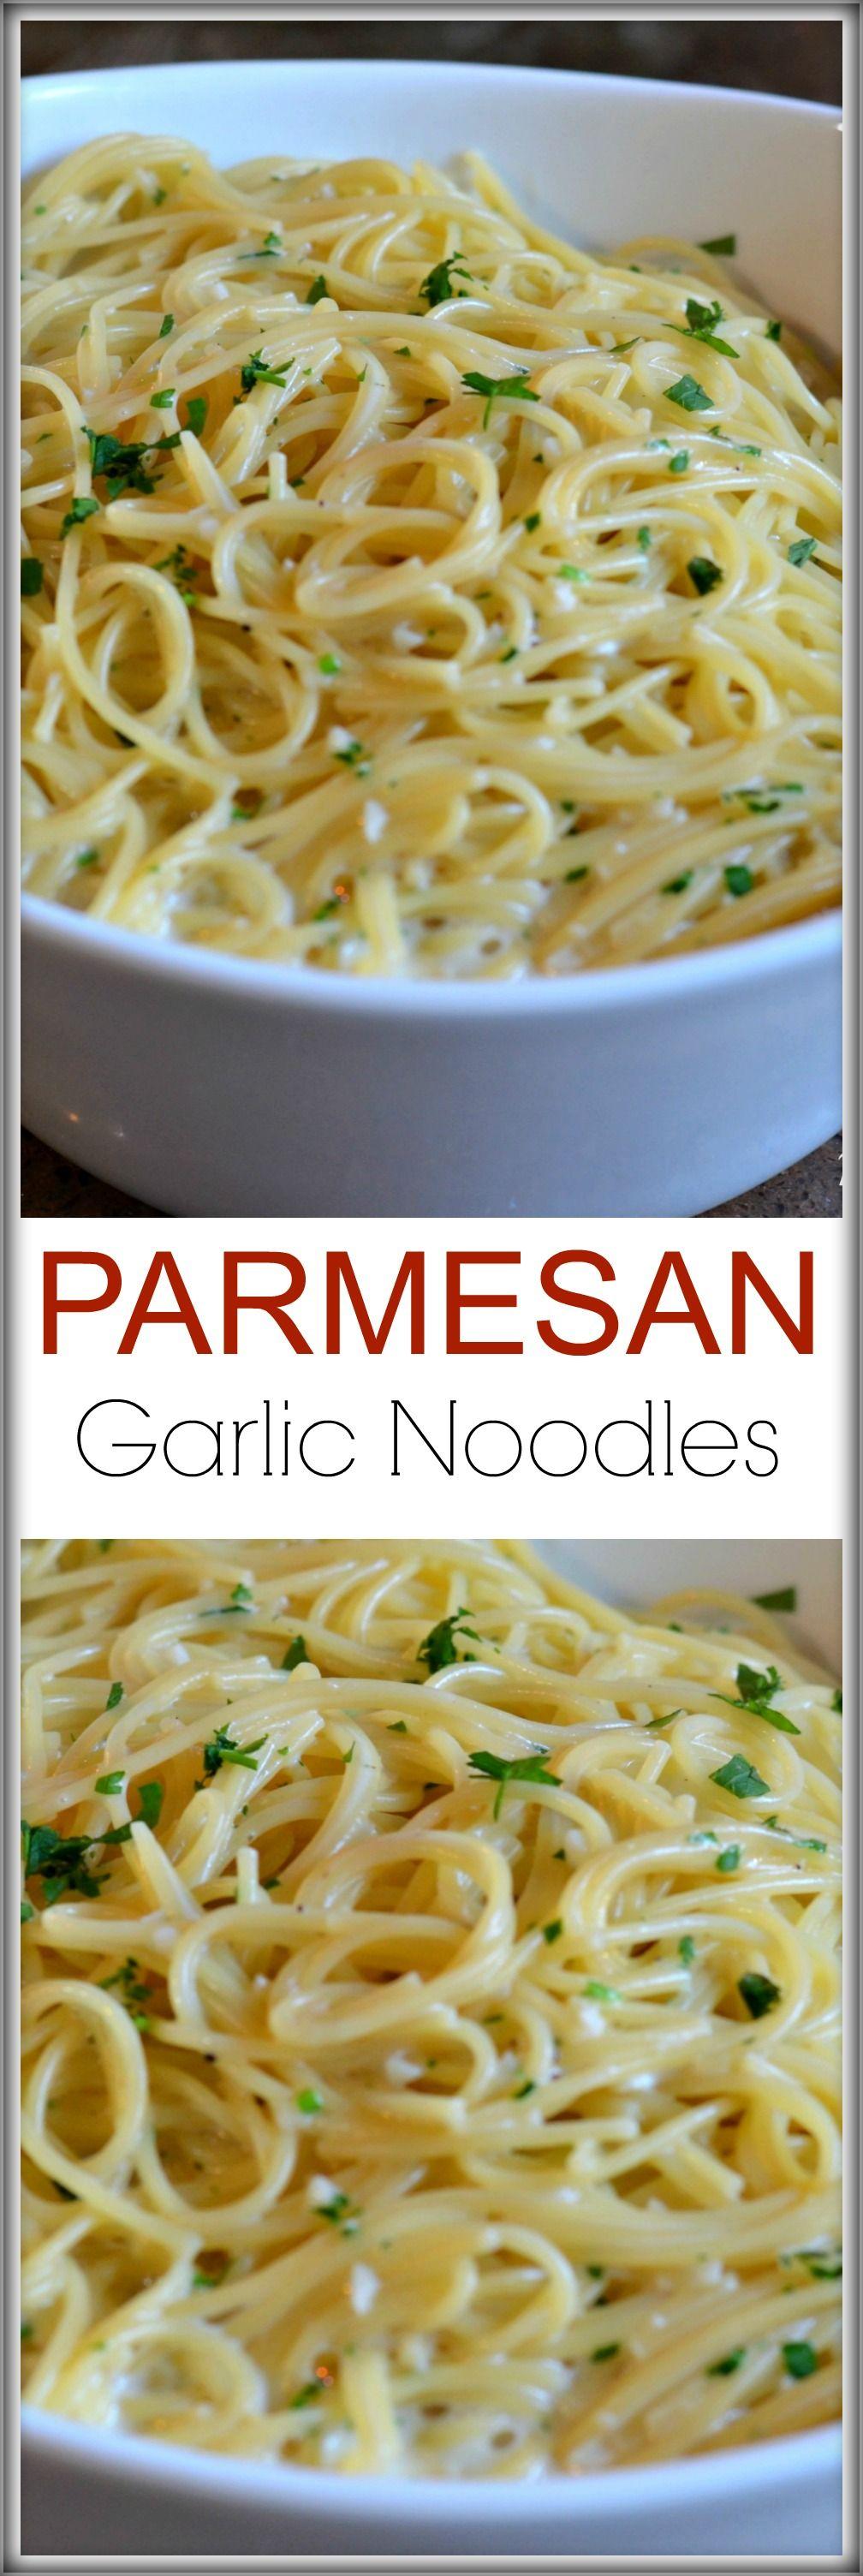 Quick easy cheese pasta recipes